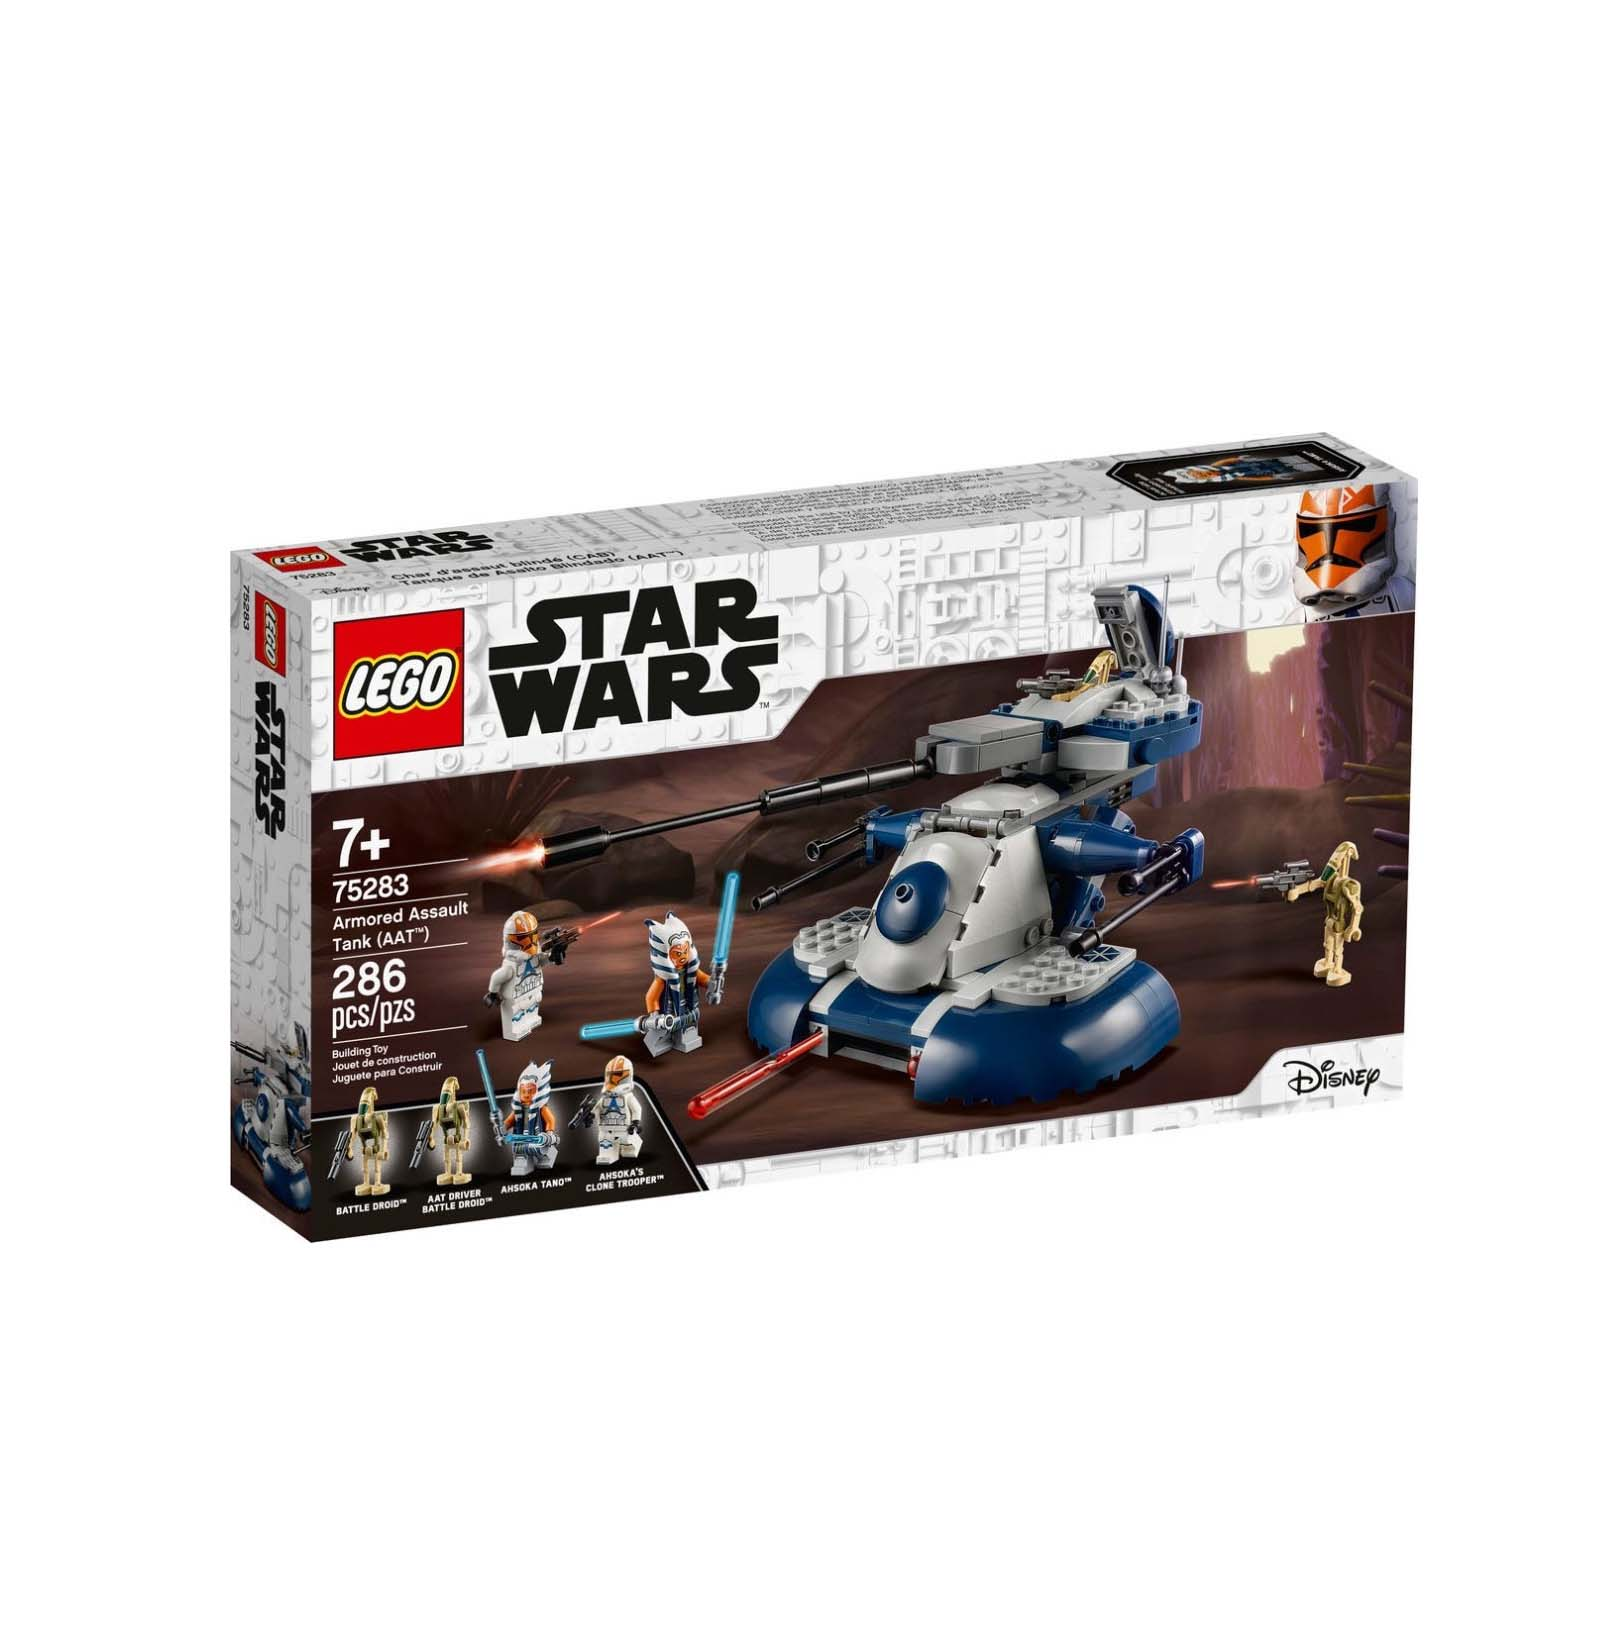 Lego Star Wars: Armored Assault Tank AAT 75283